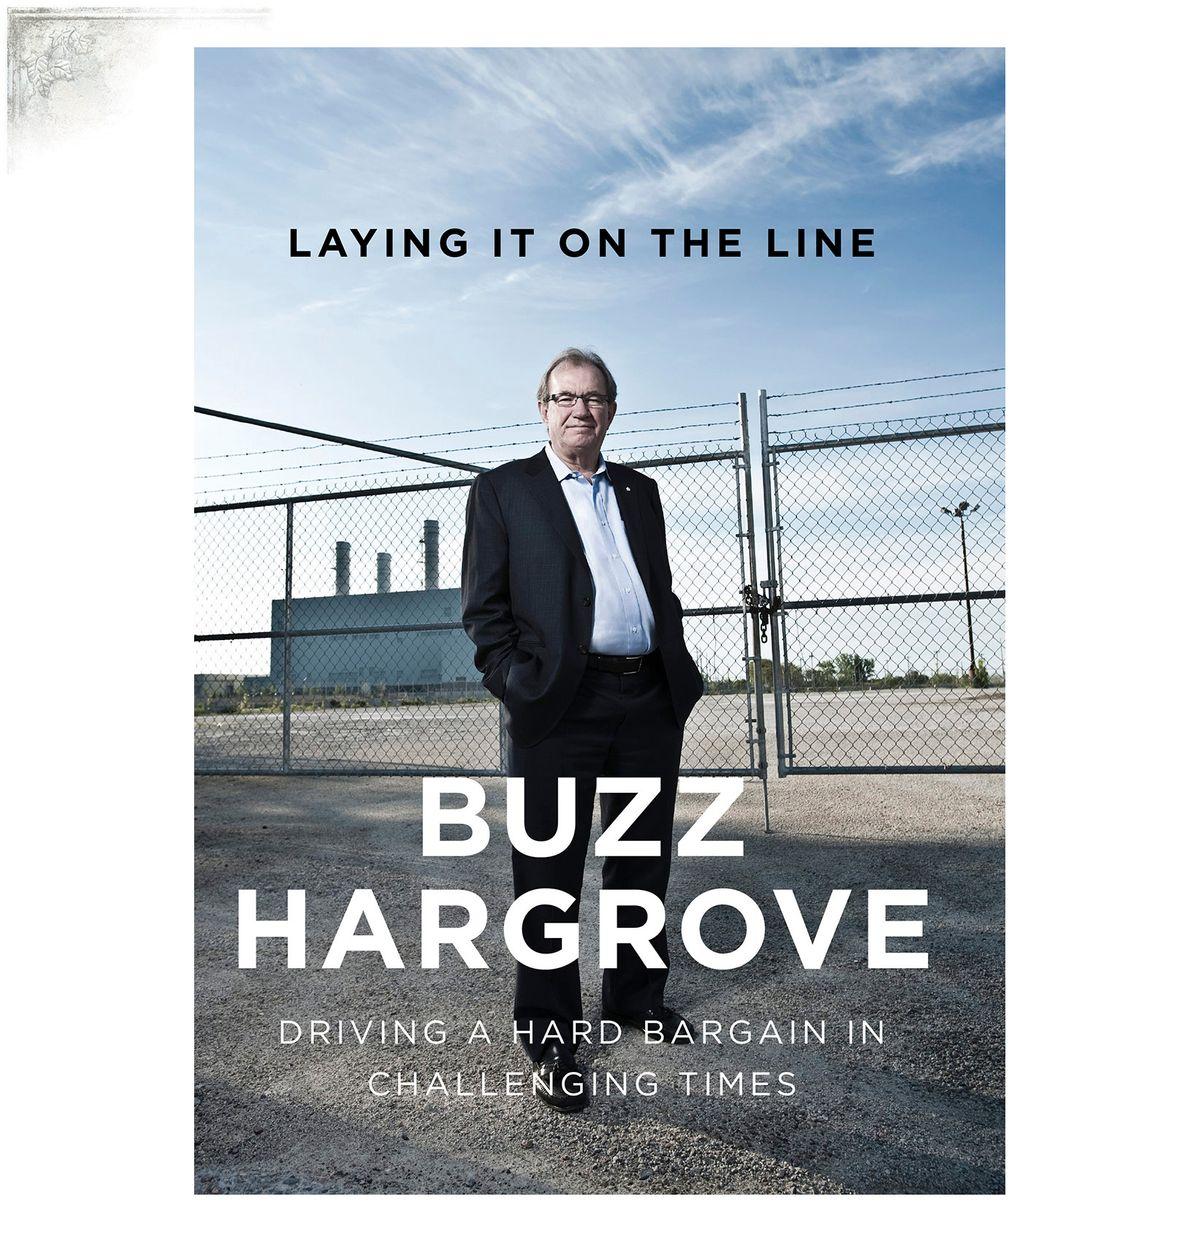 BuzzHargrovePortfPage.jpg